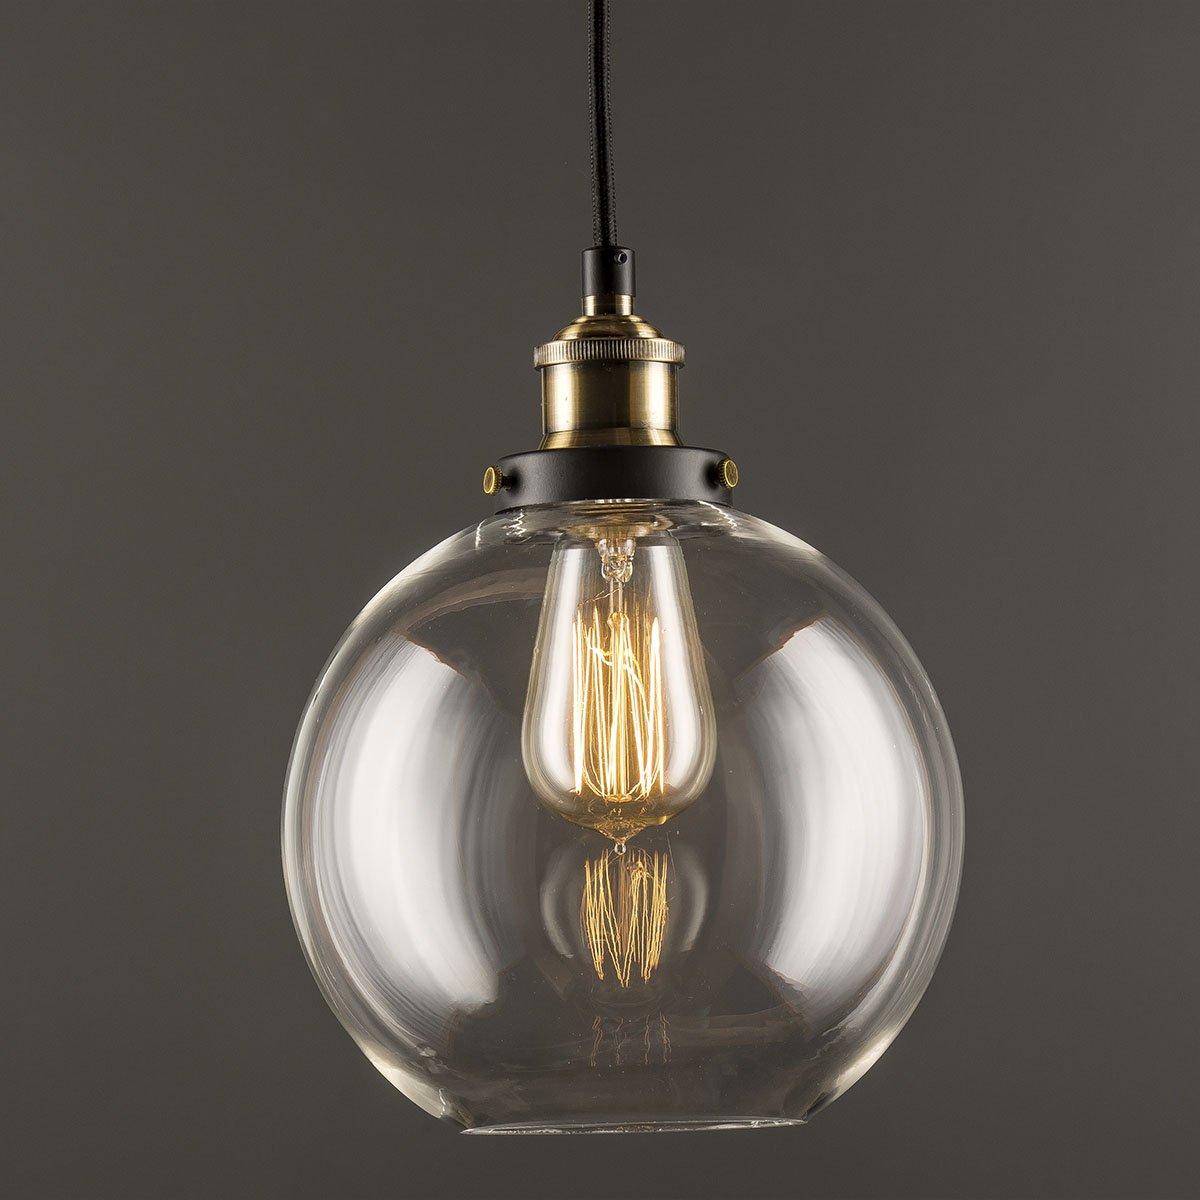 Linea Di Liara Primo Industrial Factory Pendant Lamp